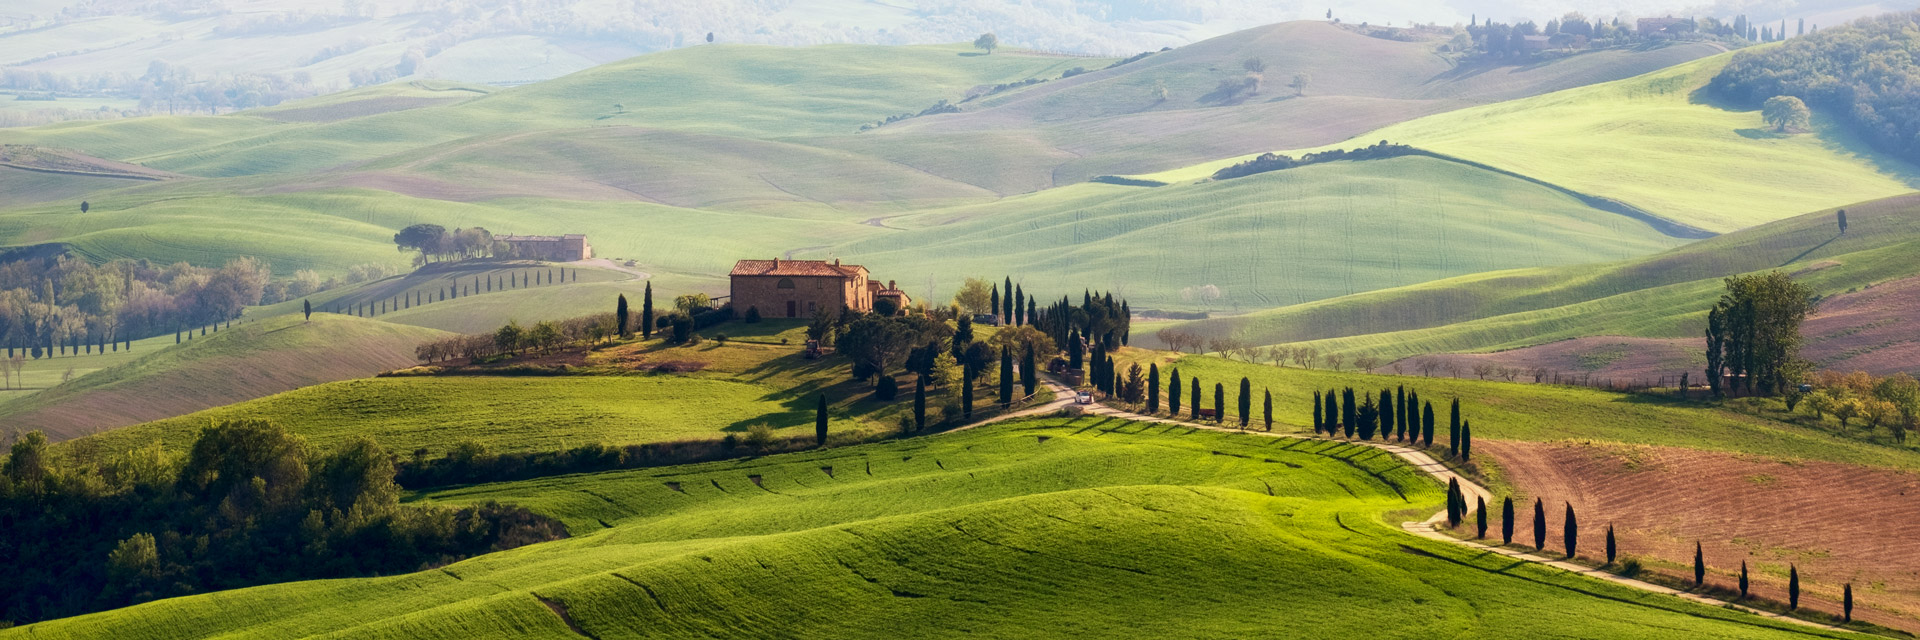 Thomas Menk Tuscany